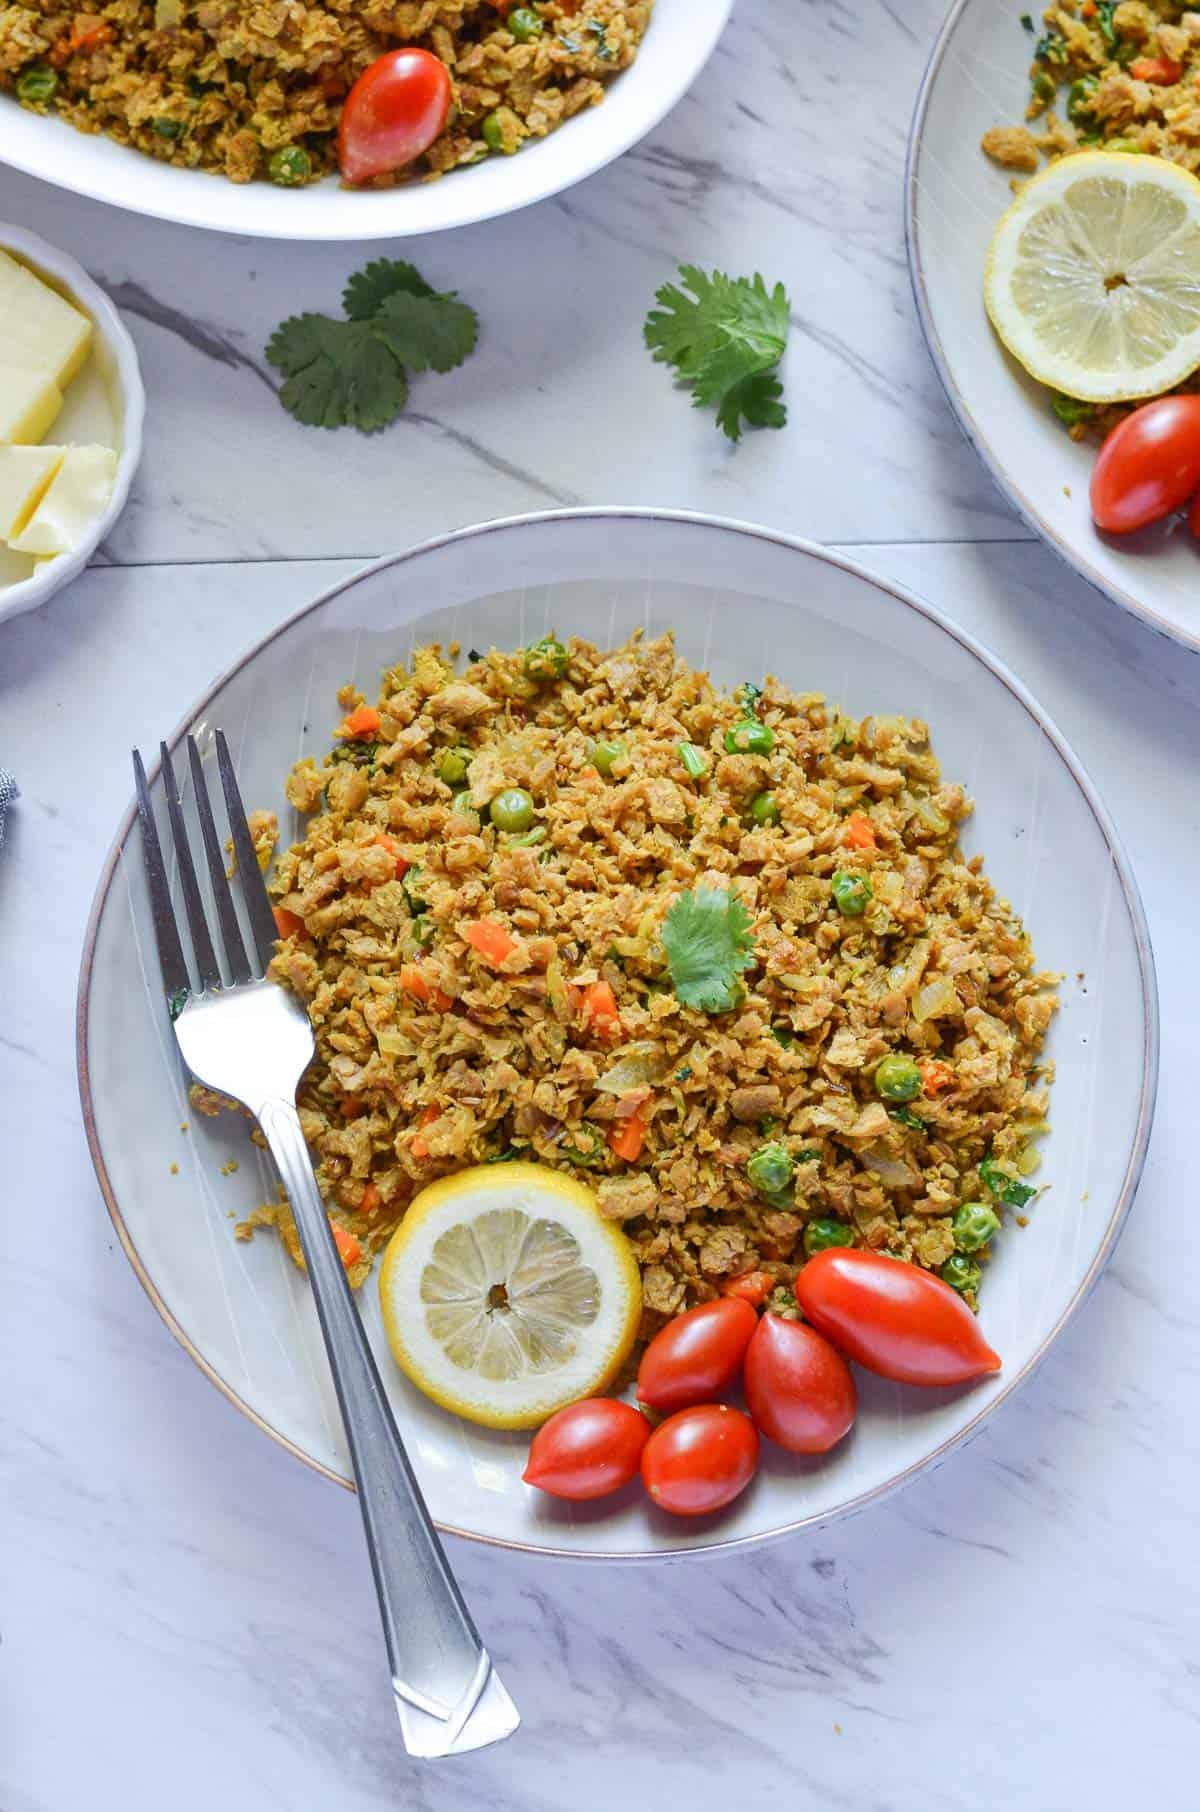 veggie scramble is served with tomatoes, lemon wedge & fork.